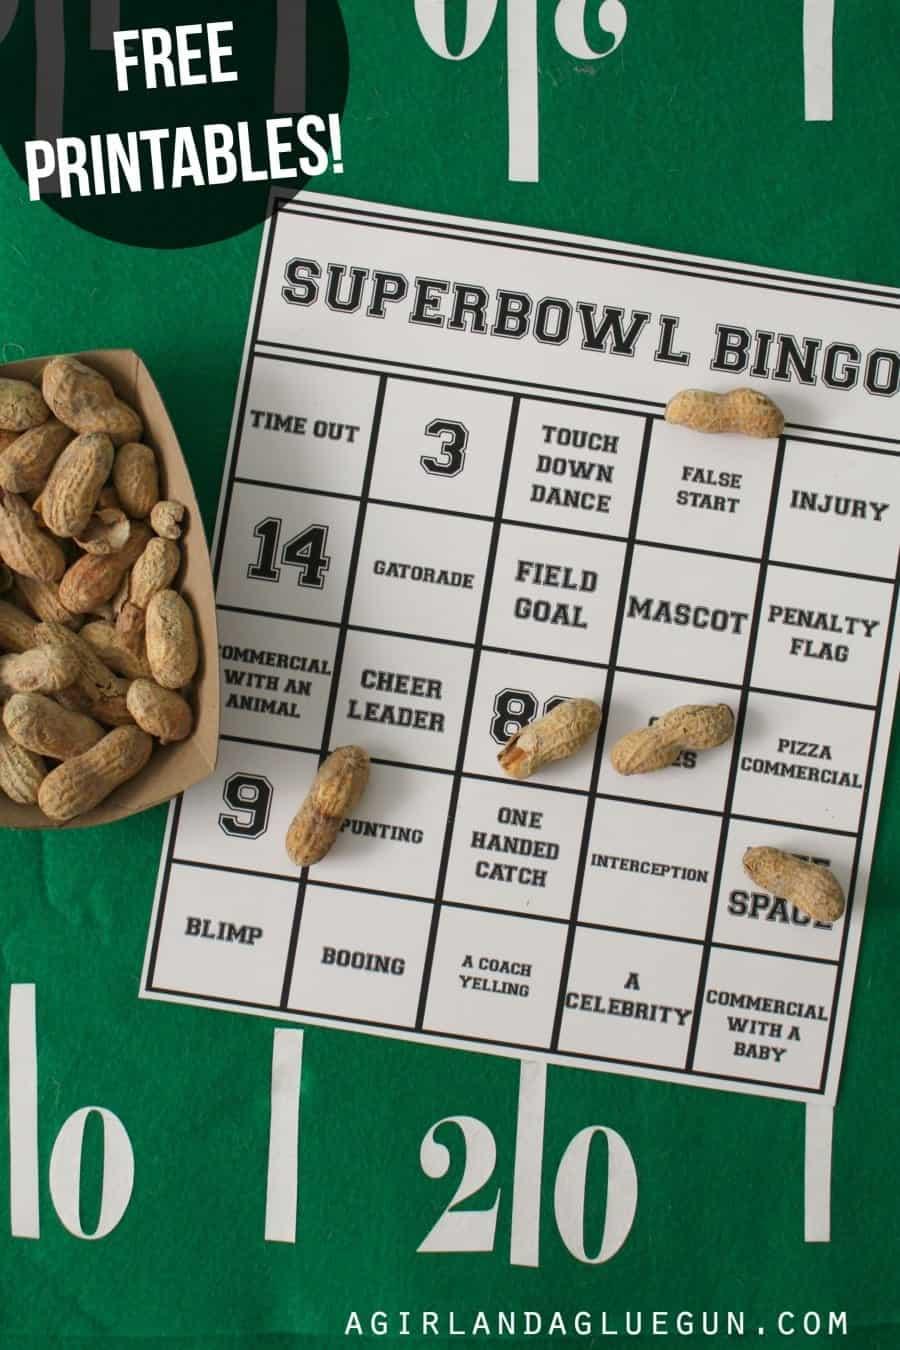 superbowl bingo-- 15 free printables